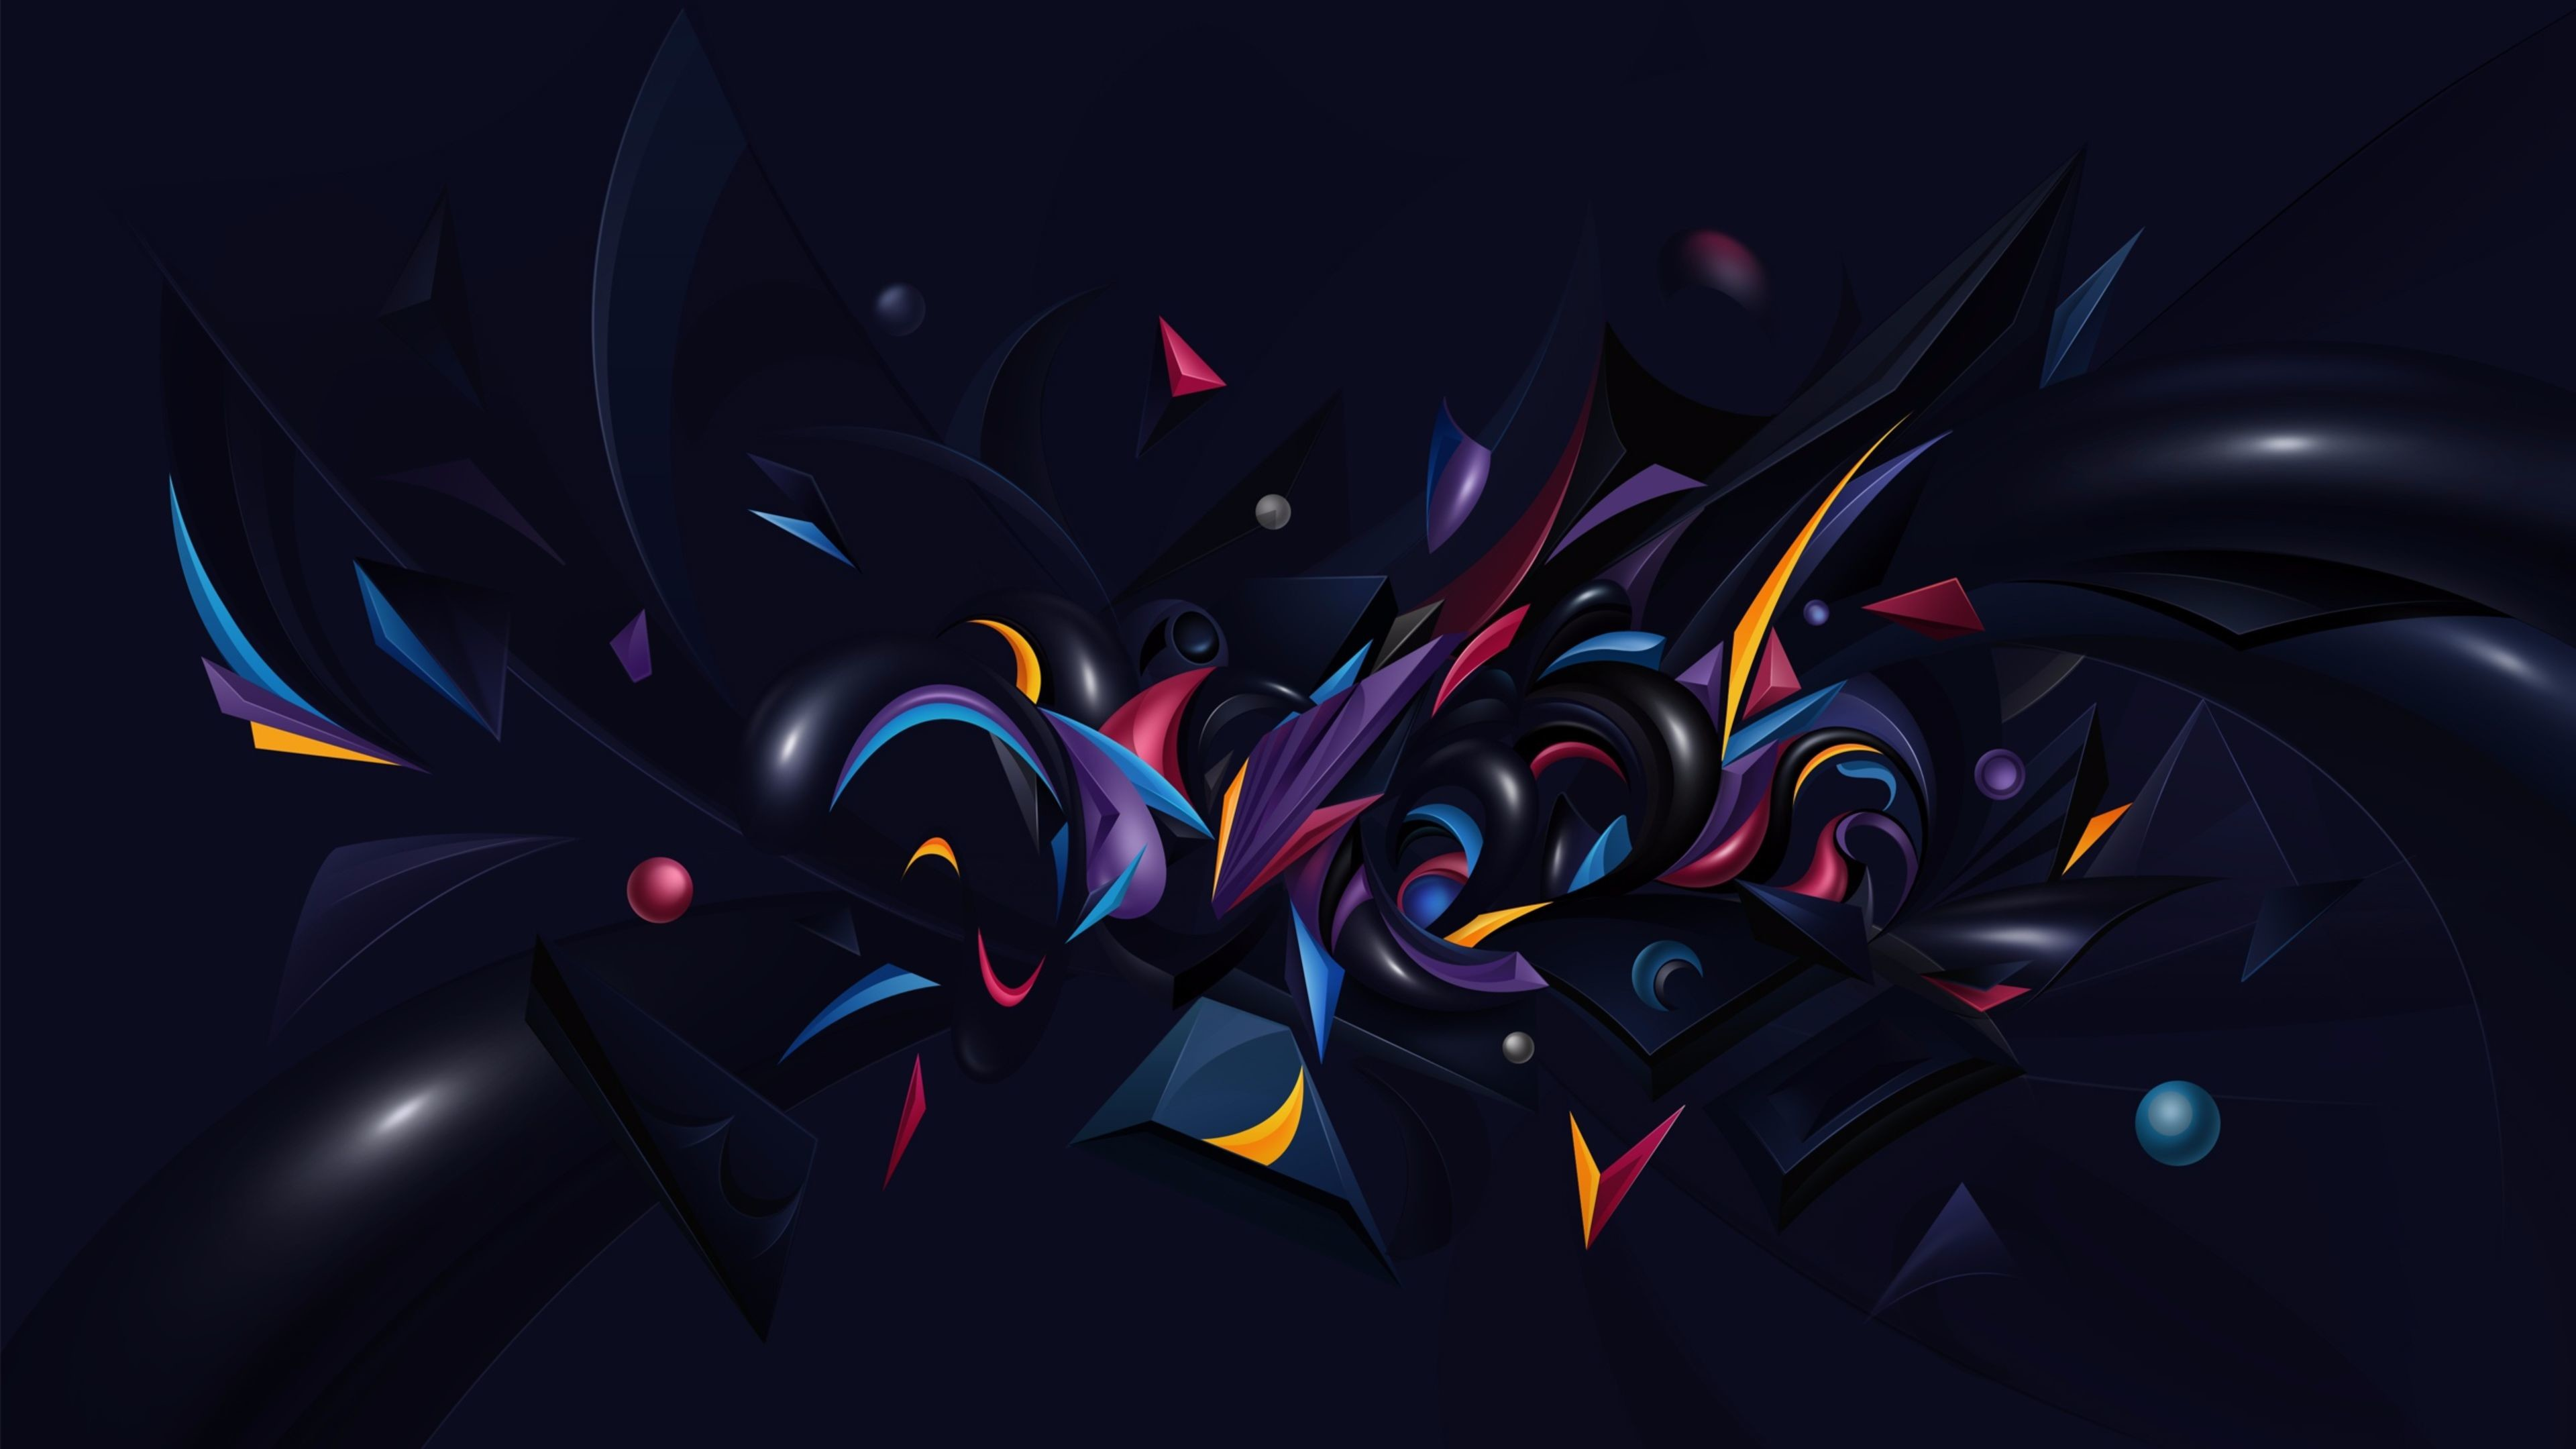 <b>abstract 4k wallpaper</b>